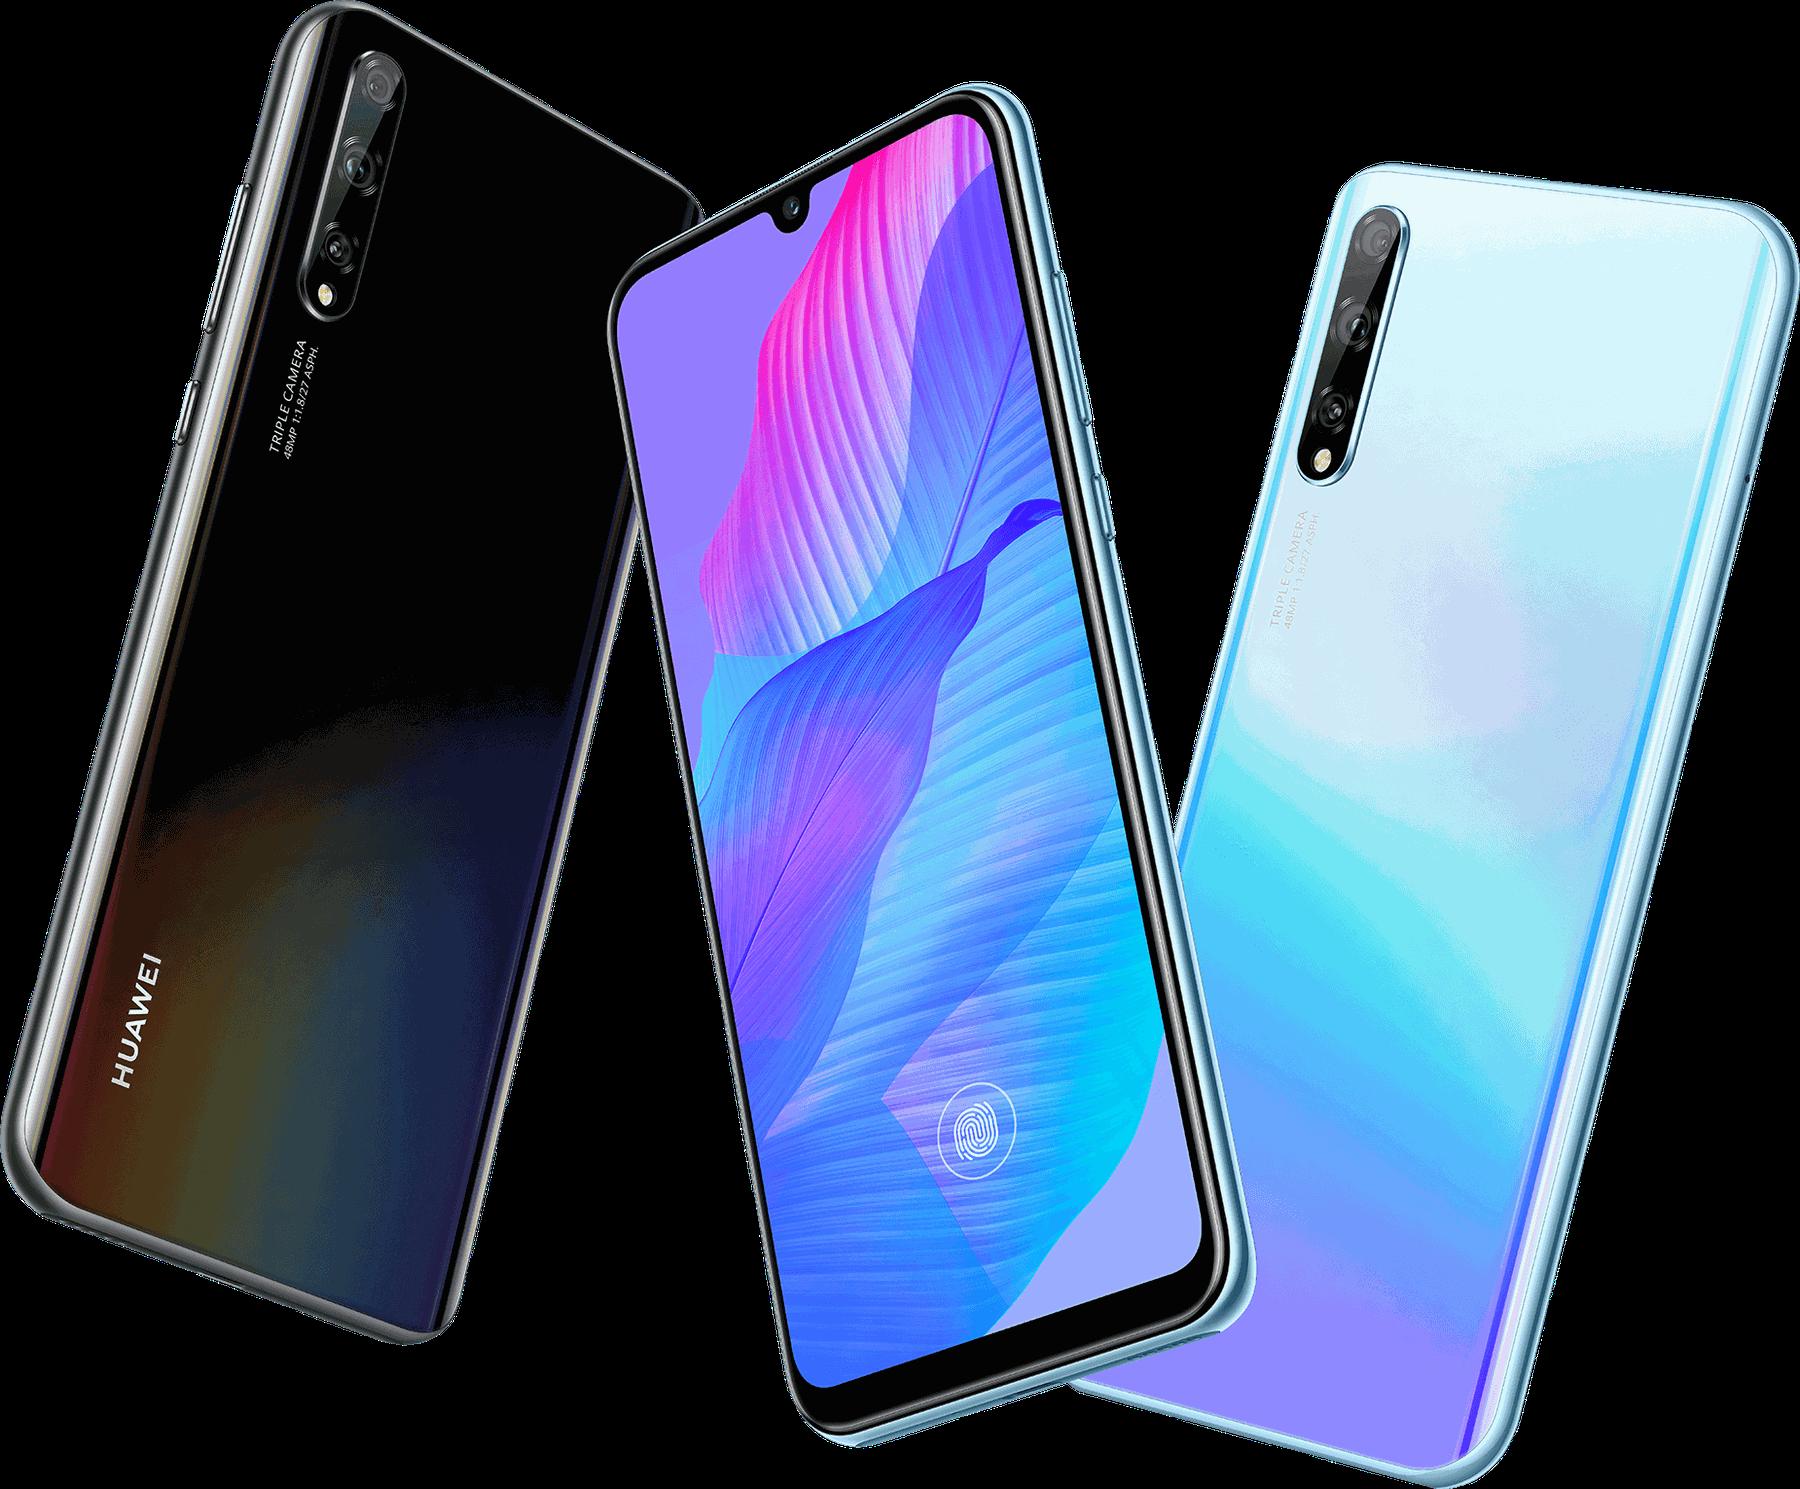 smartfony huawei s nfc modulem